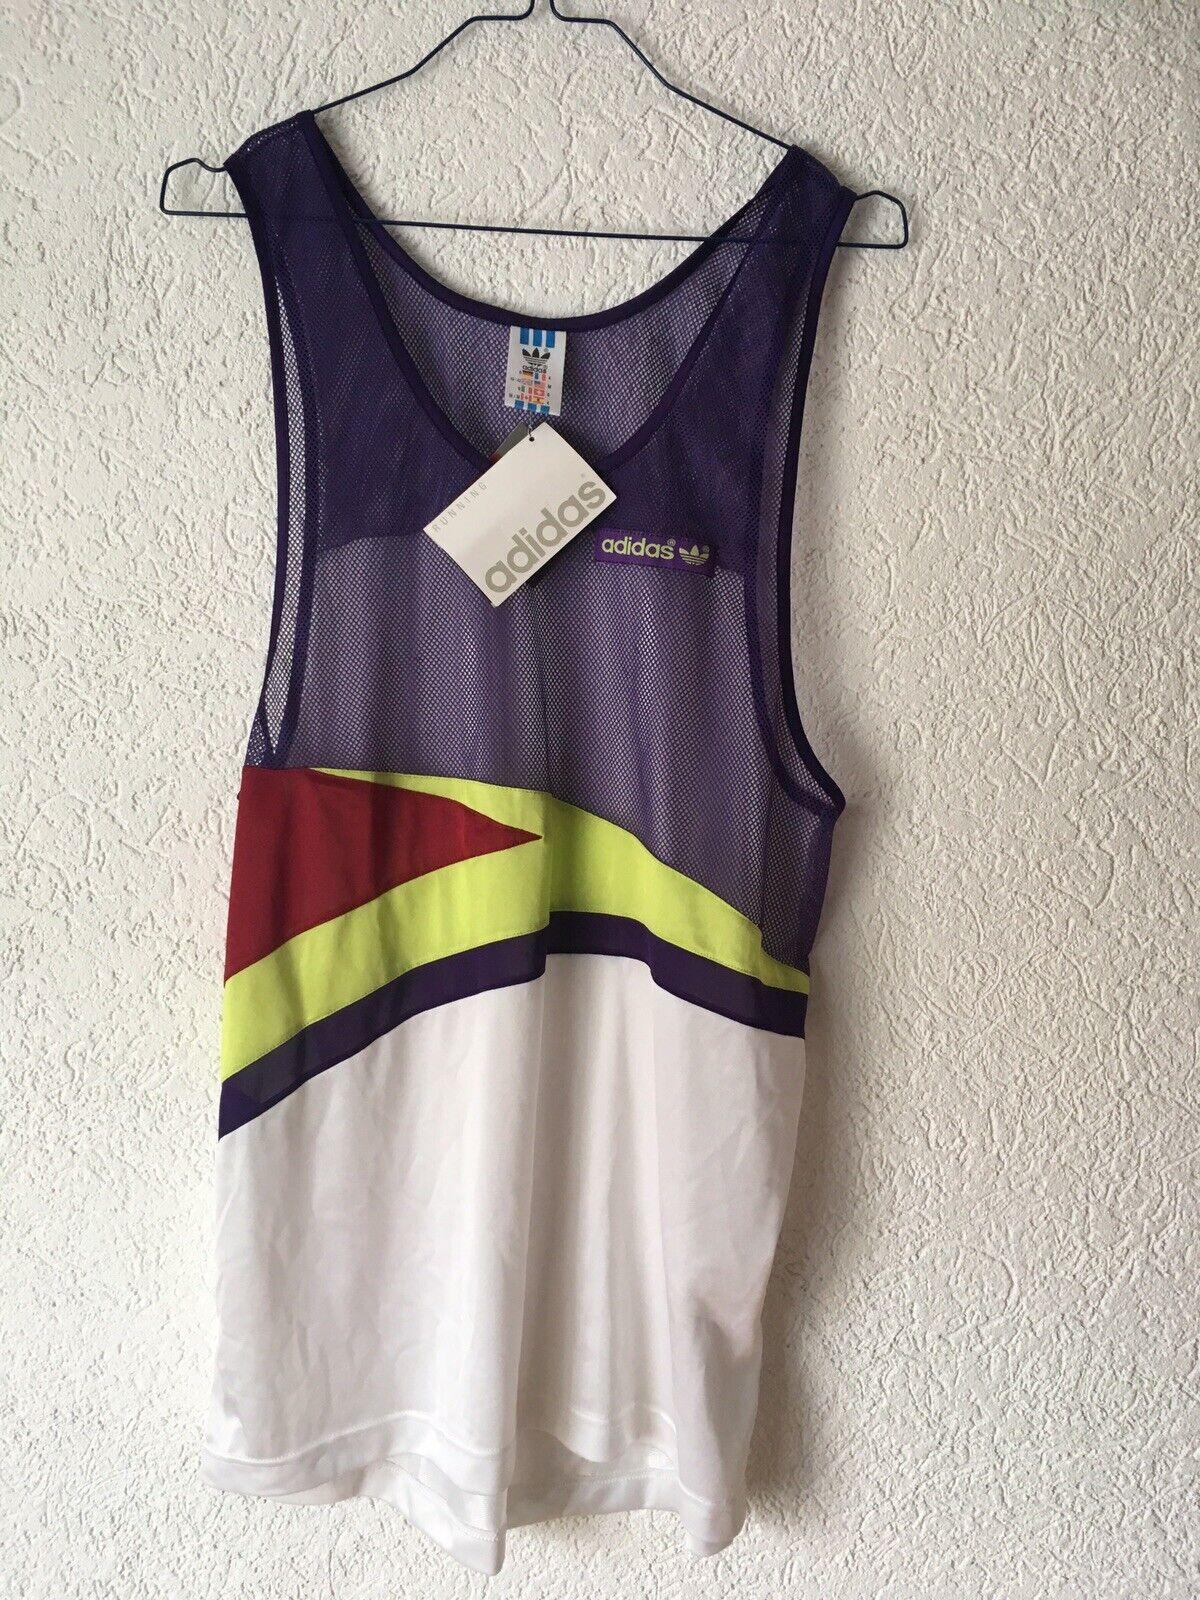 Adidas Shirt M Sprinter Laufen Jogging Fitness Vintage Glanz Nylon Lycra Top Neu